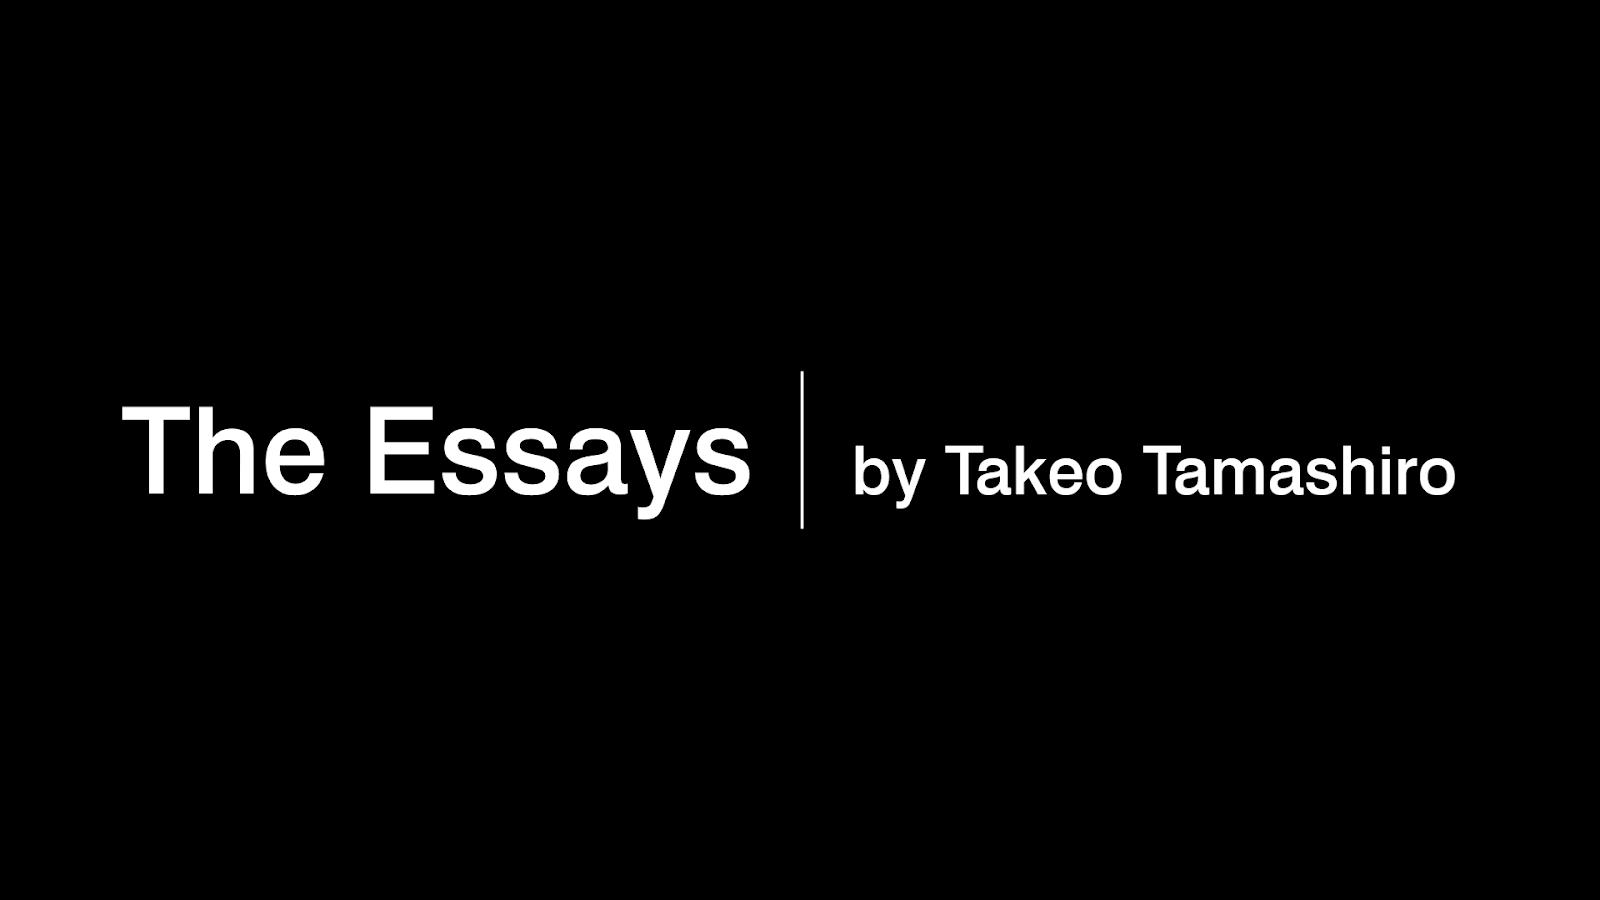 https://en.takeotamashiro.com